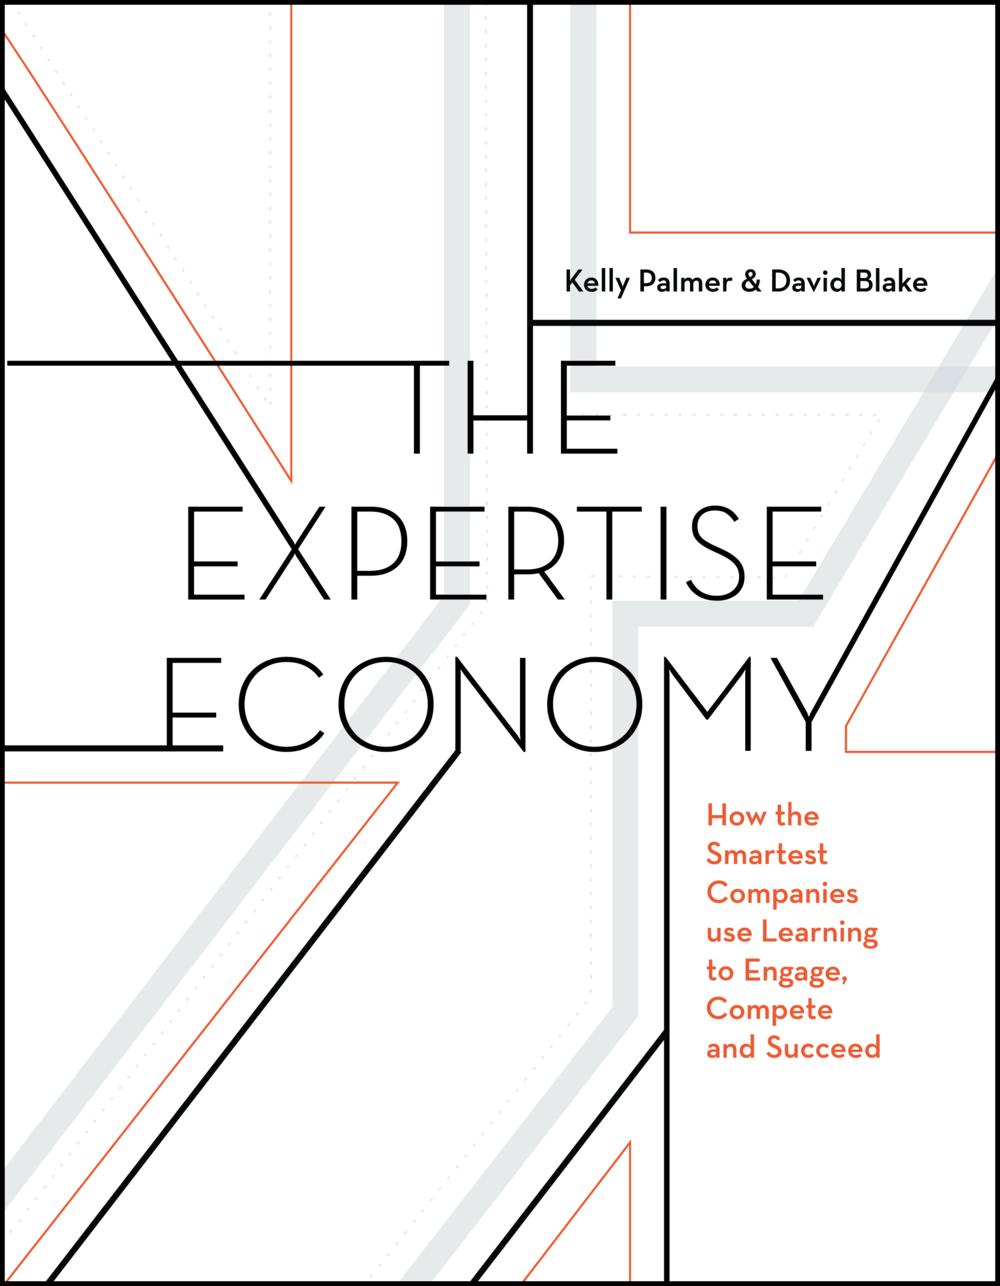 ExpertiseEconomyBorder.png